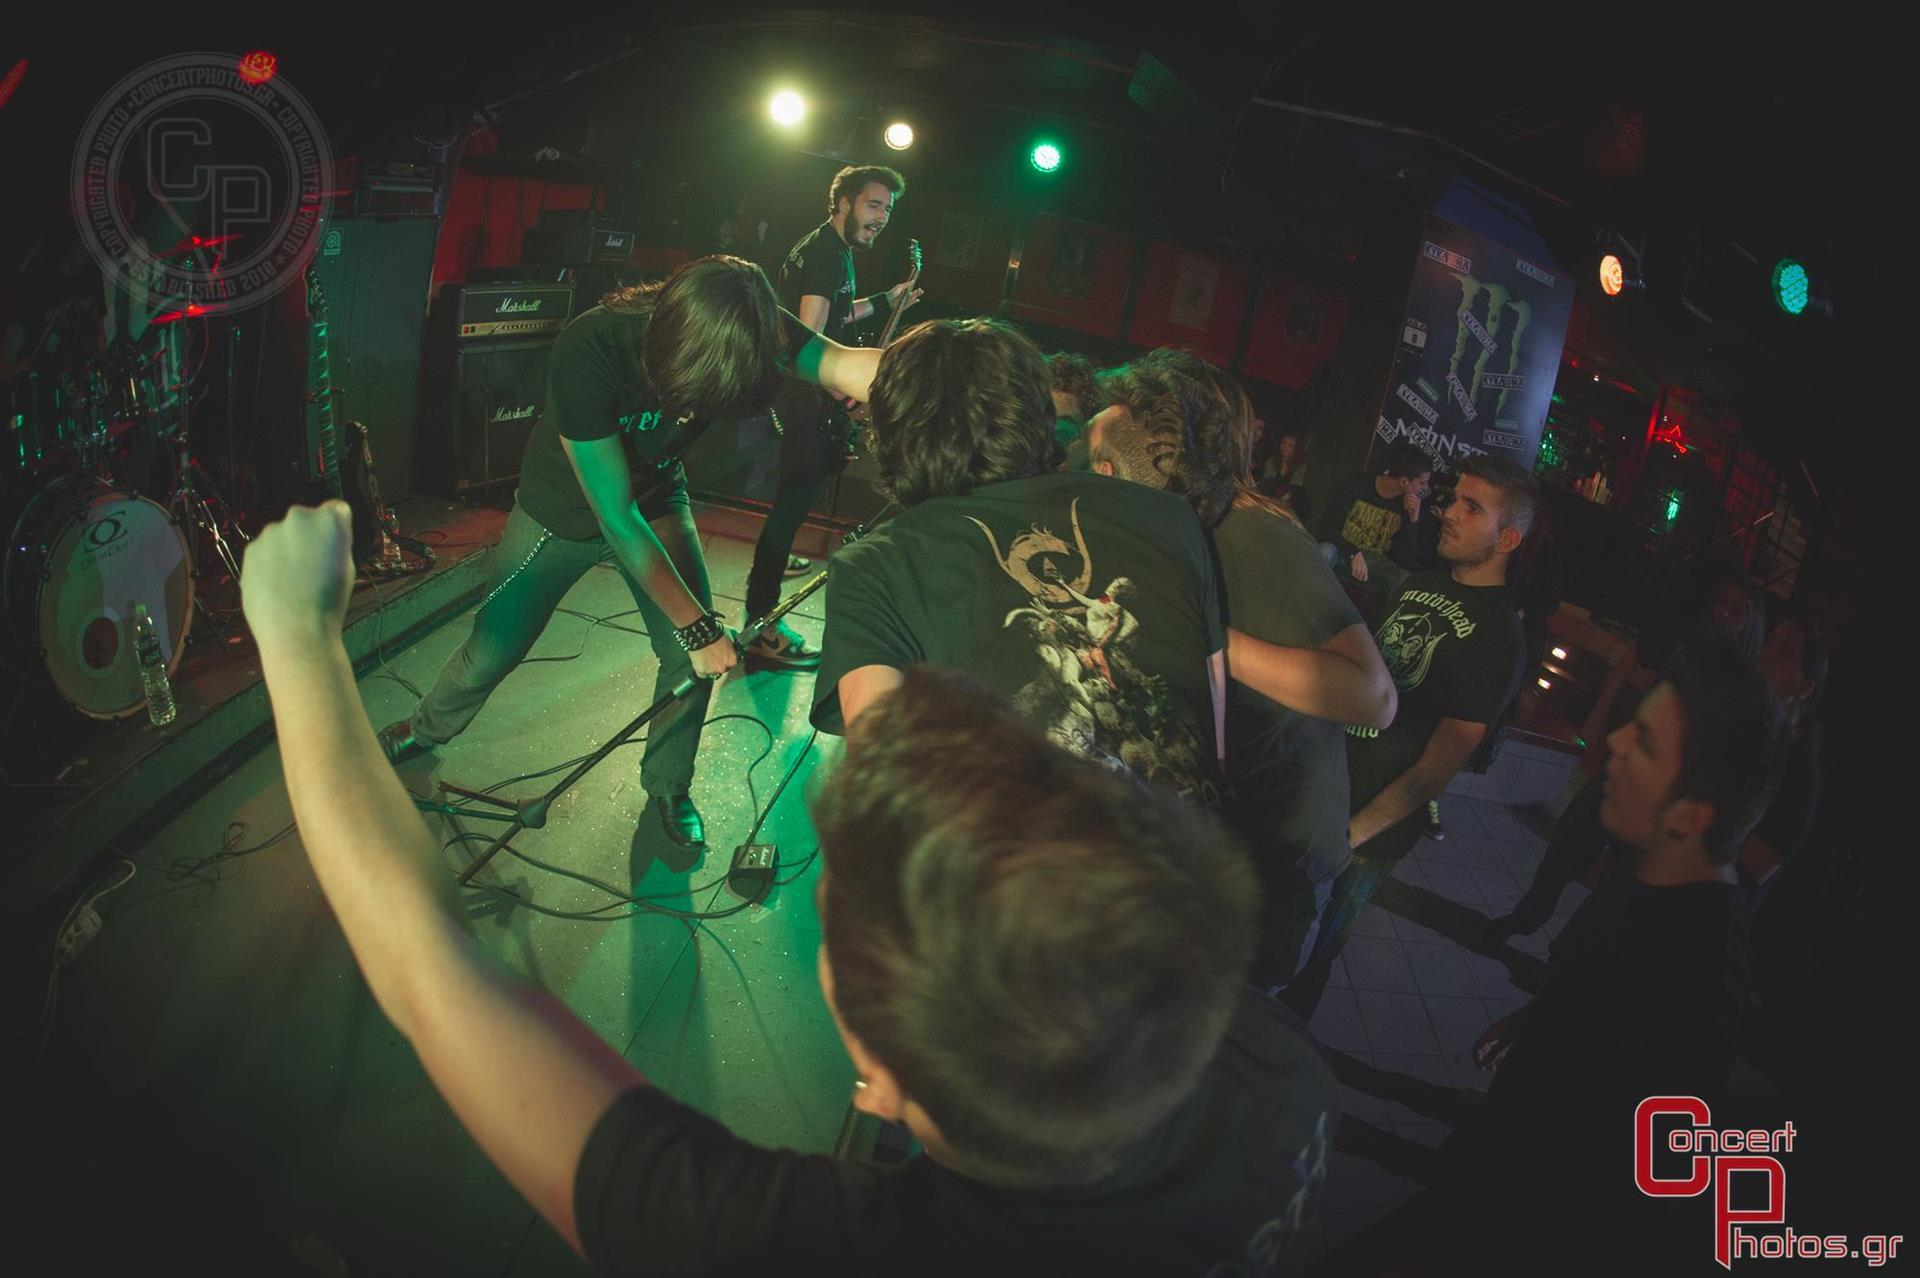 Battle Of The Bands Athens - Leg 3- photographer:  - ConcertPhotos - 20150104_2320_23